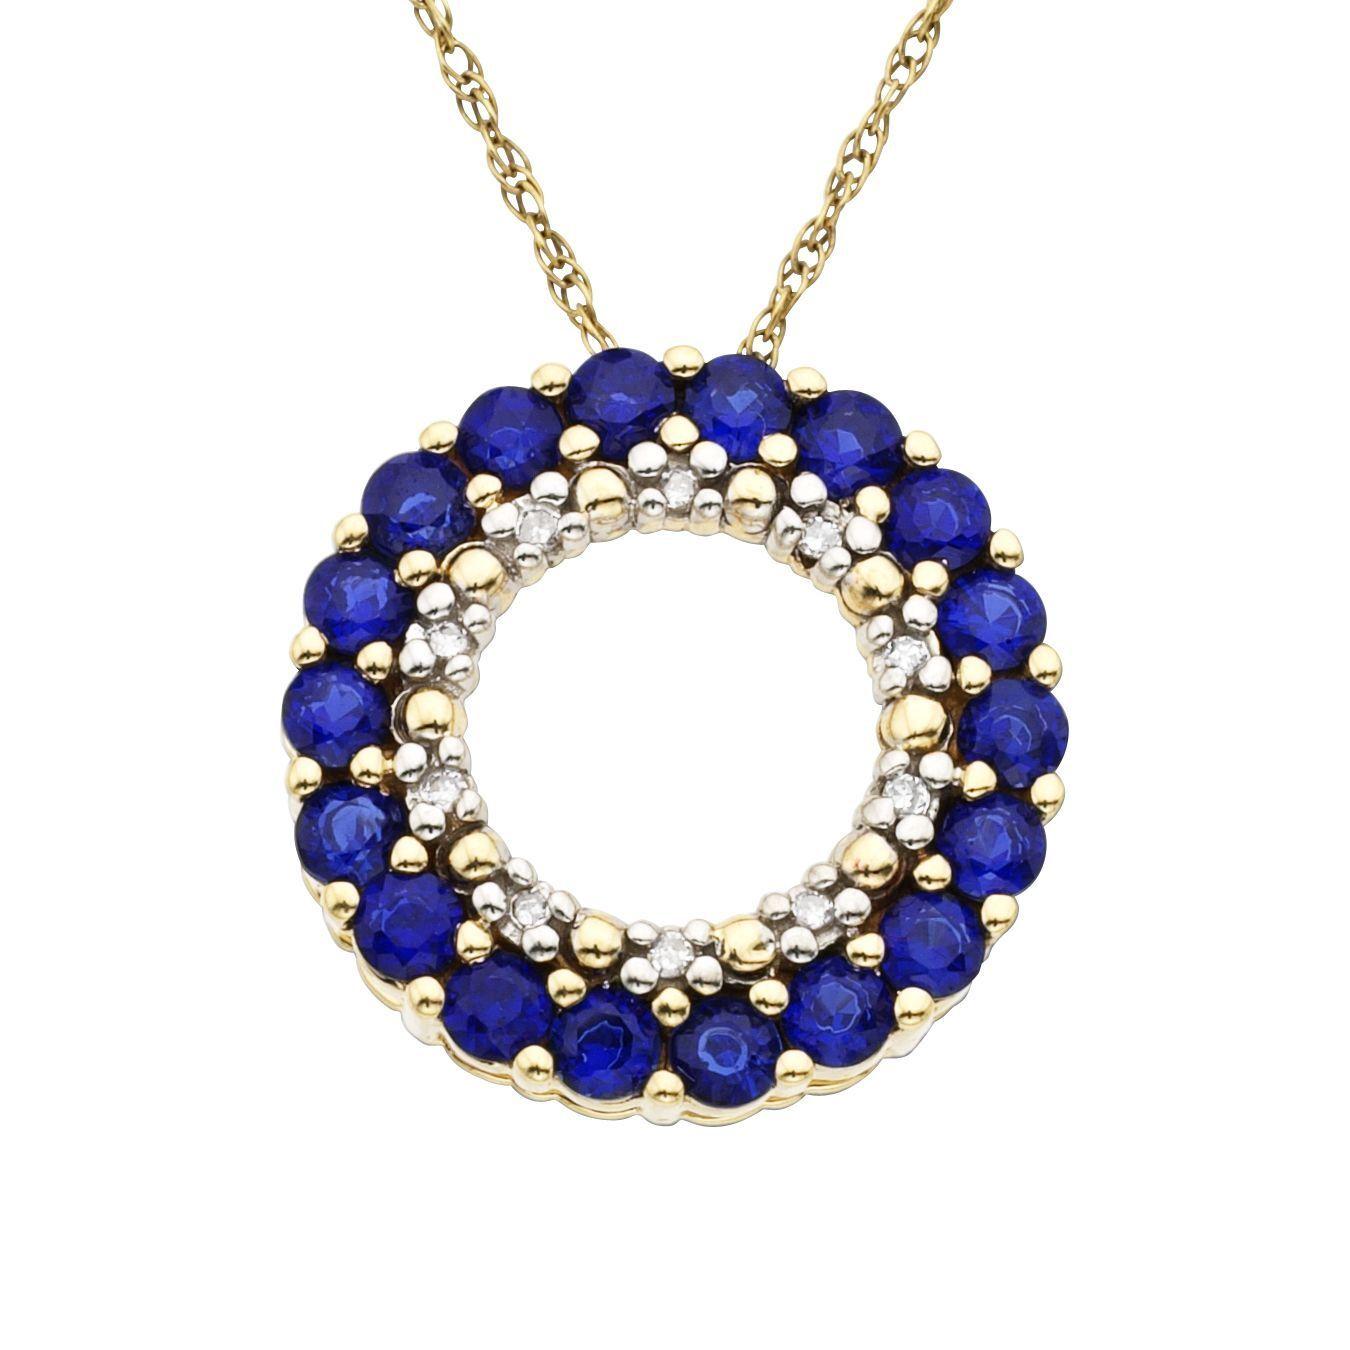 10K Yellow gold Sapphire Pendant